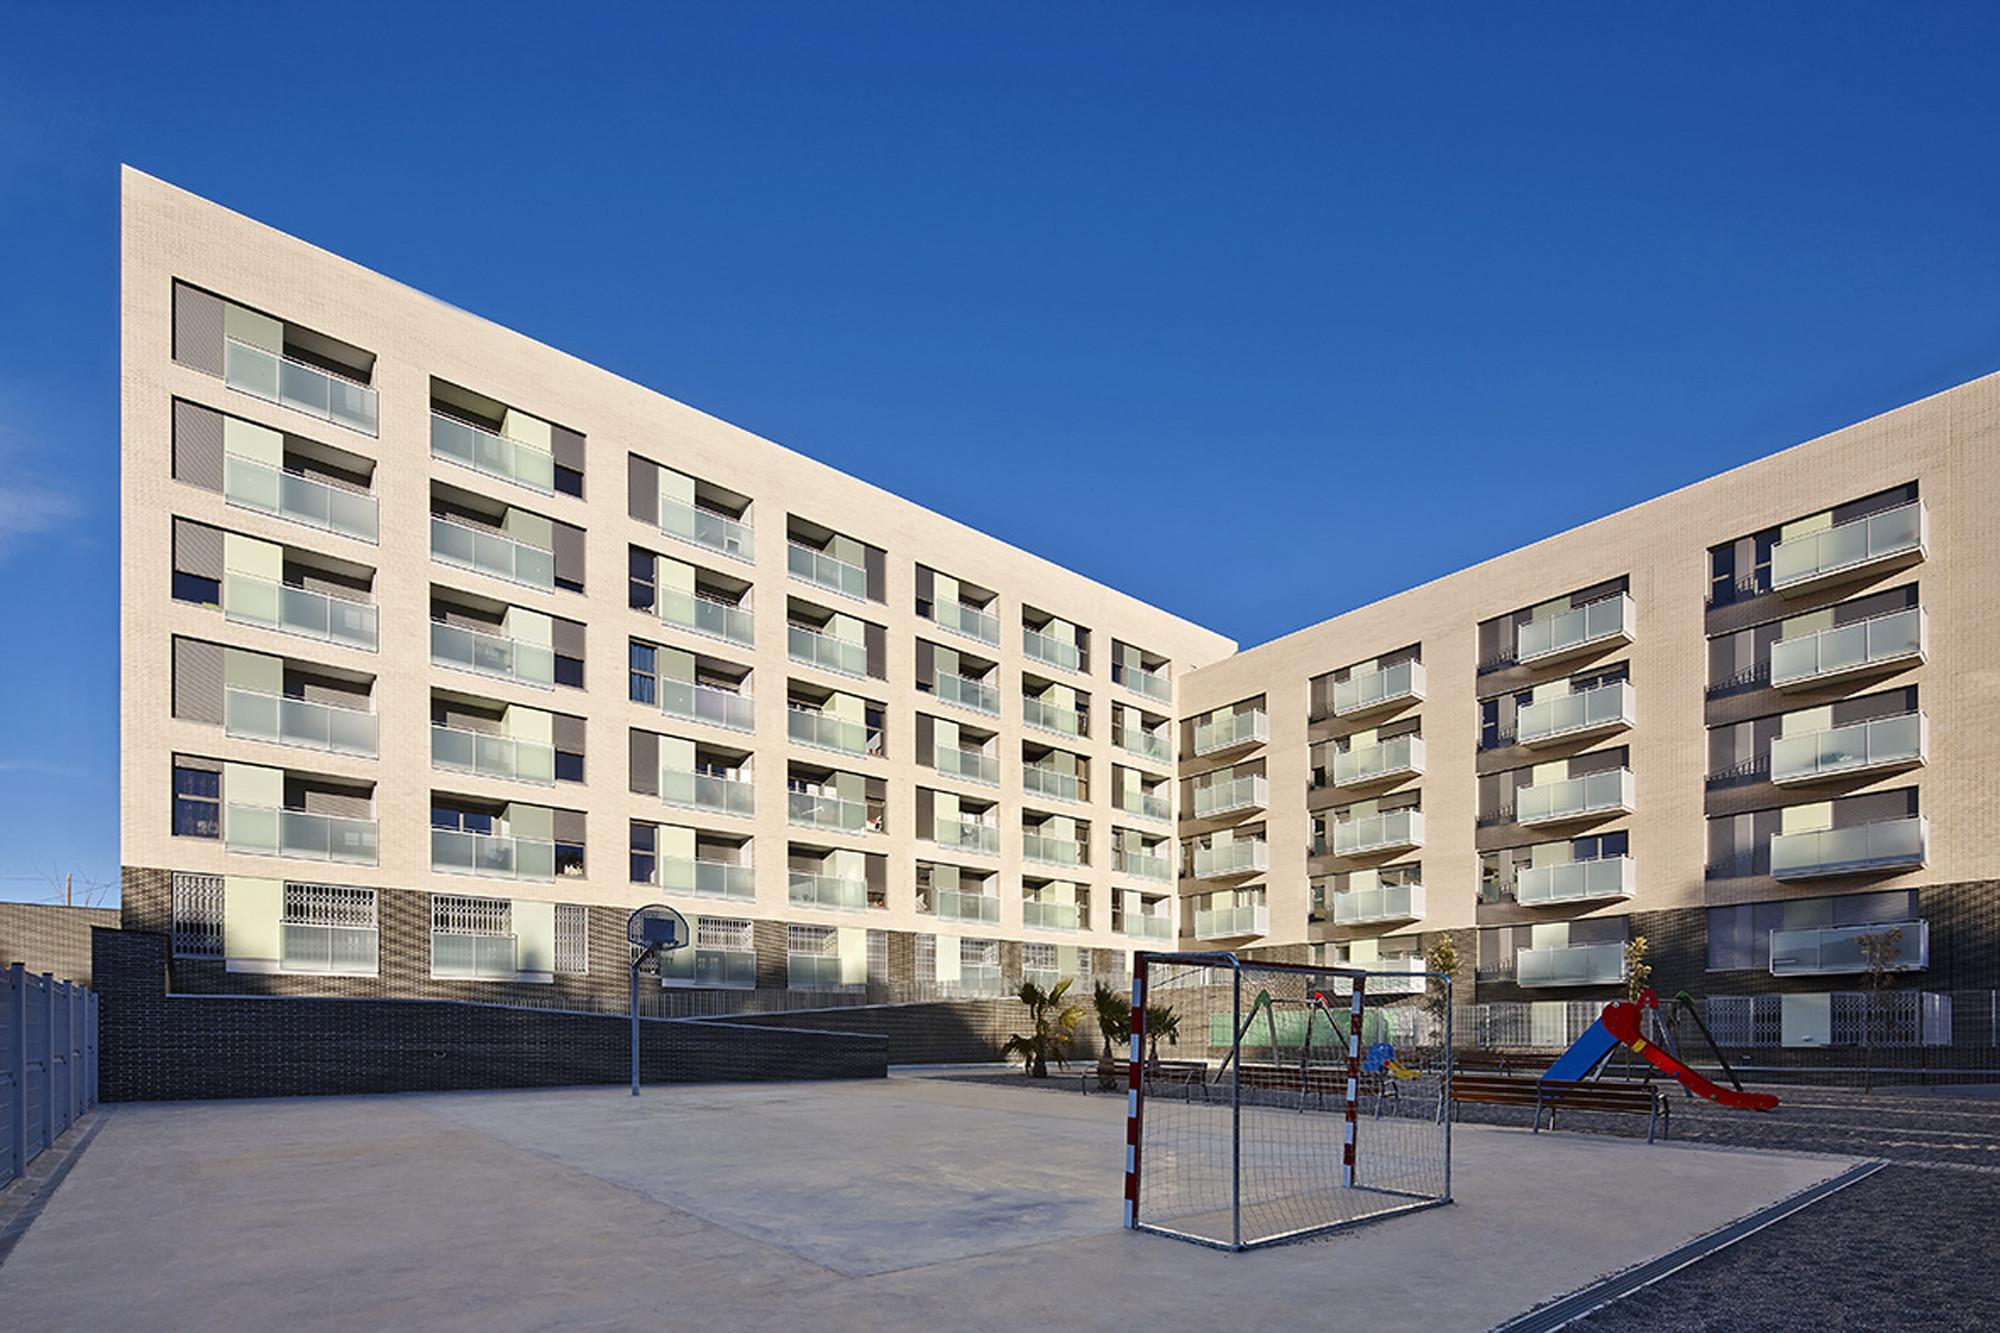 Galer a de viviendas sociales de alquiler en terrassa for Alquiler de viviendas